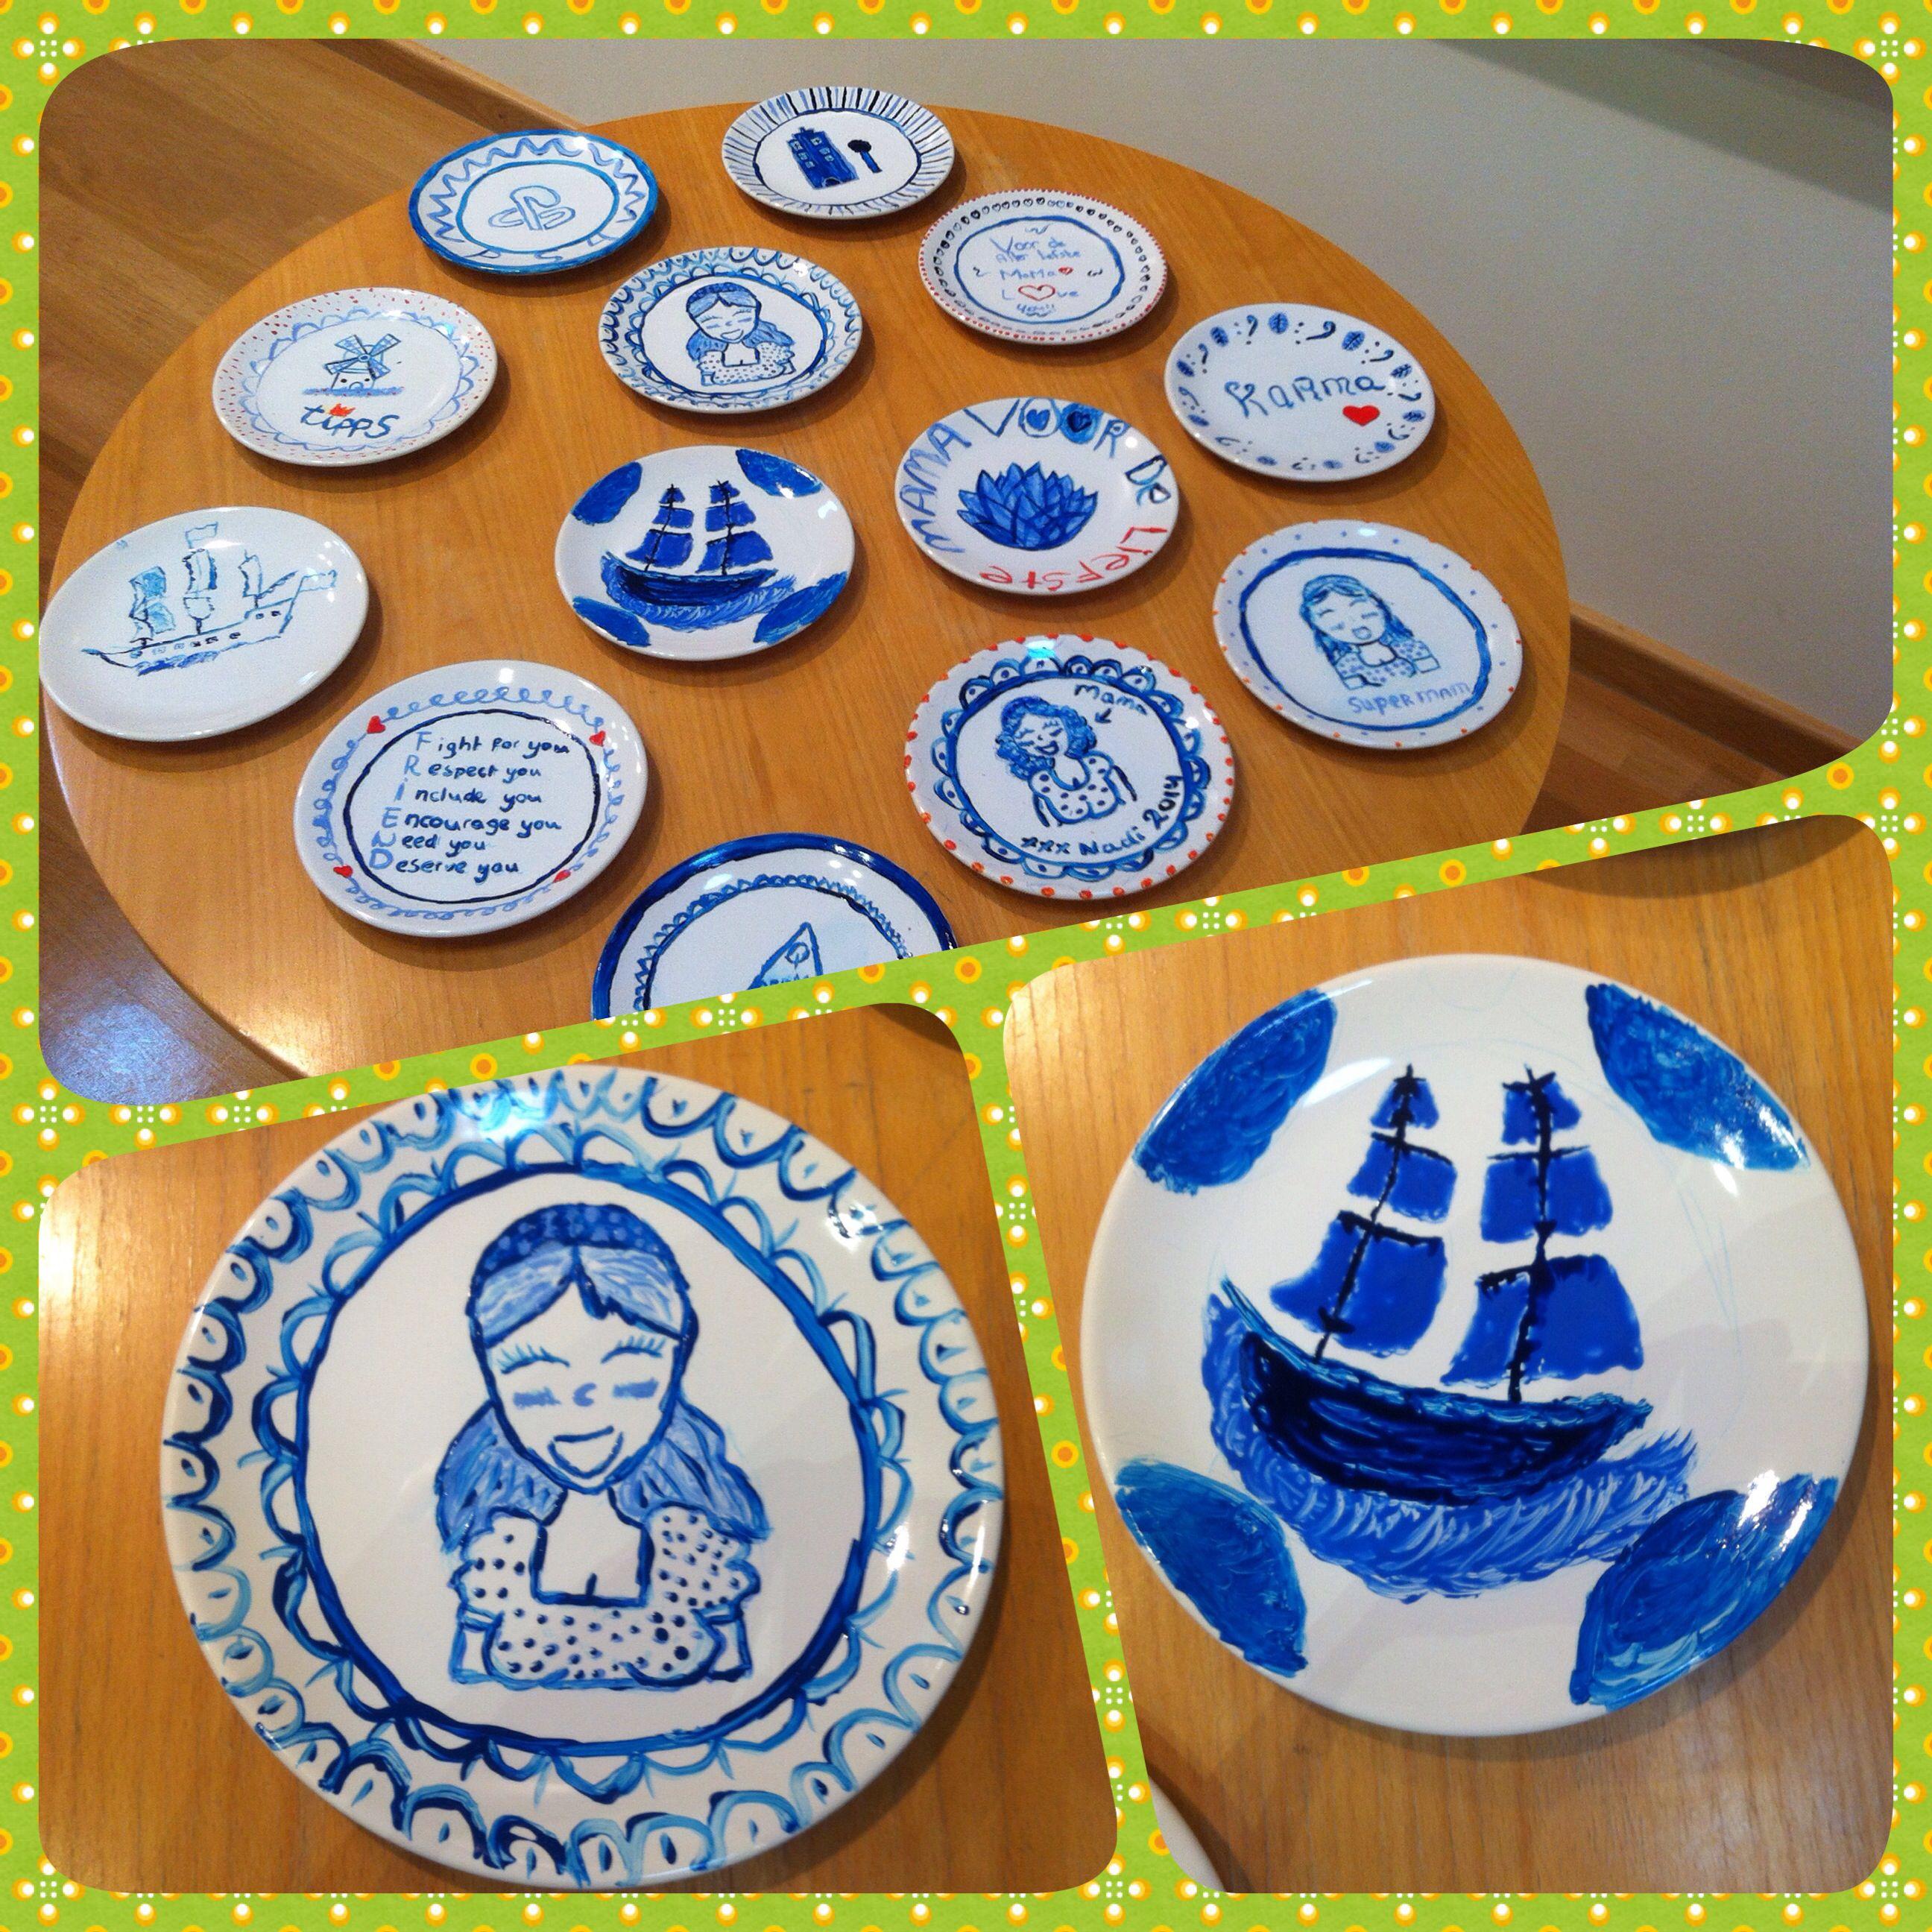 Delfts Blauw Schilderen Brugklas Brugklas Knutselen Kleurplaten